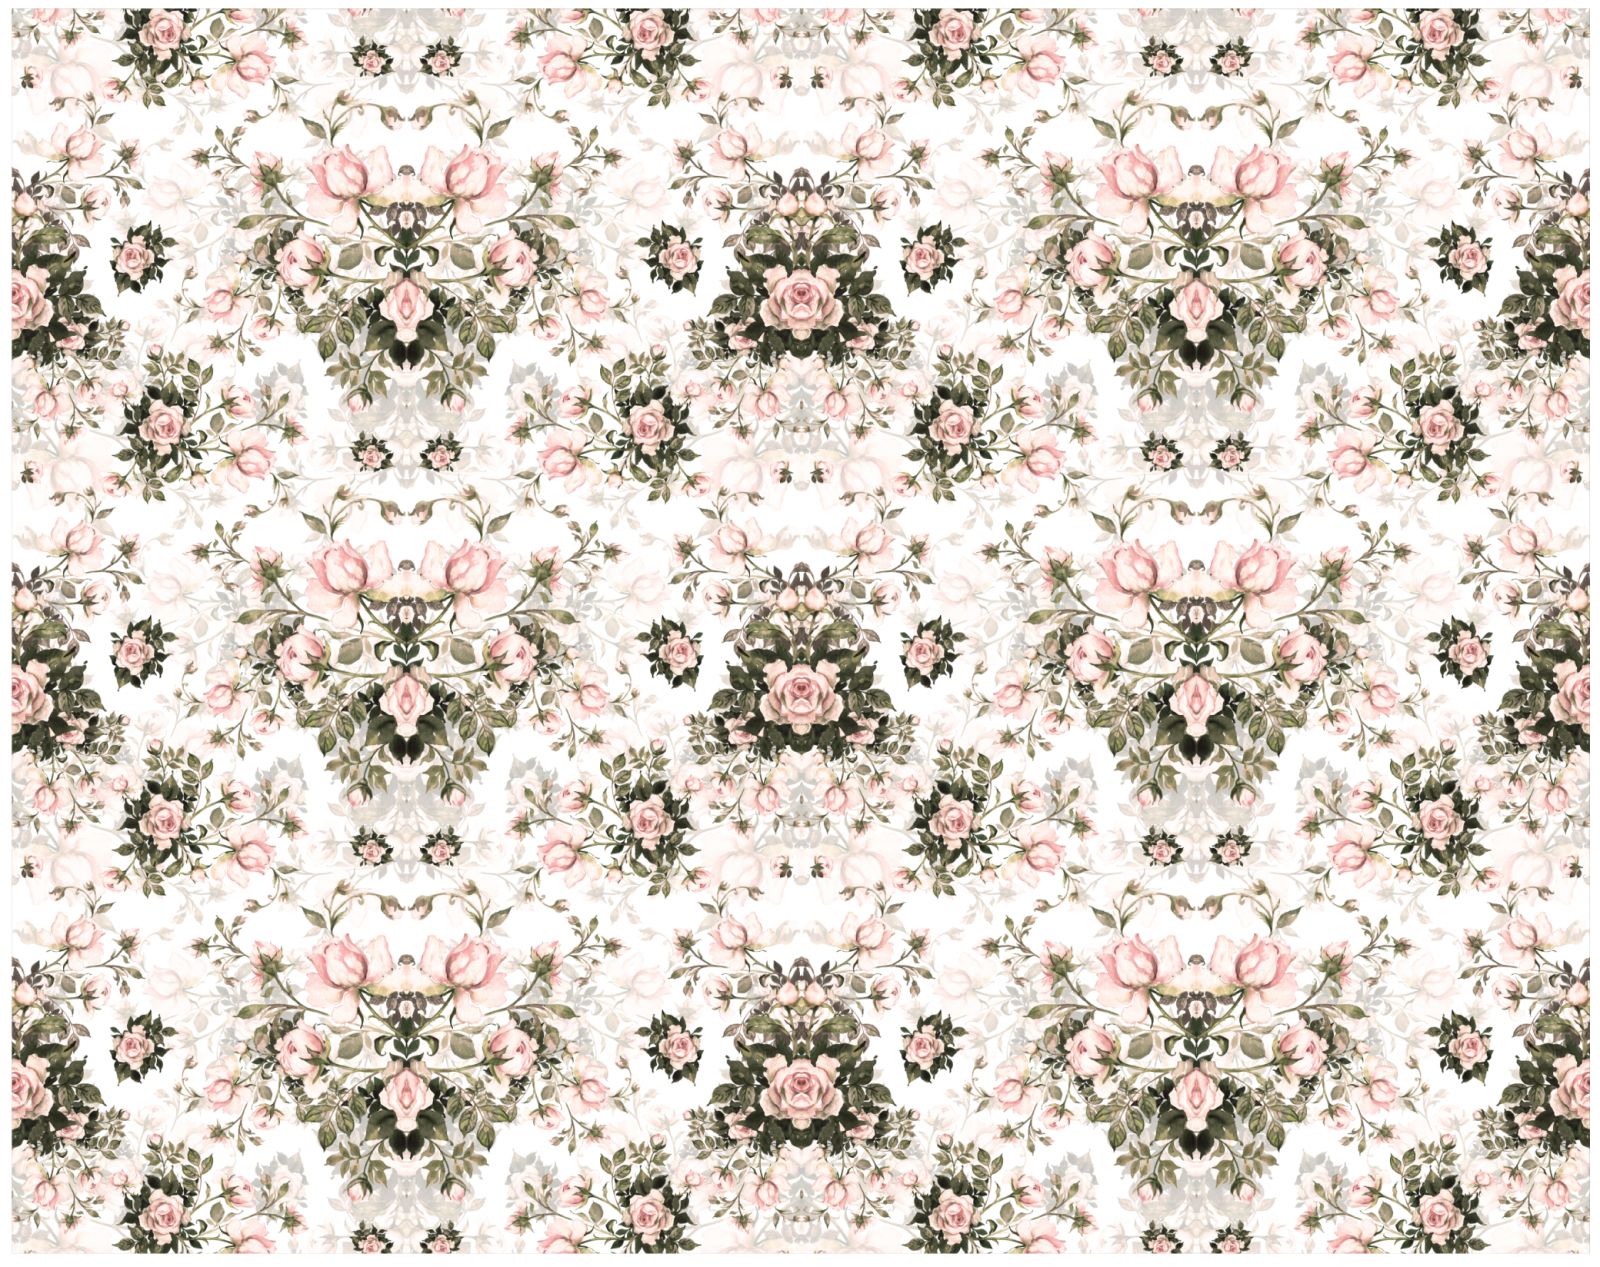 Papel de Parede Rosas | m² imagem 3